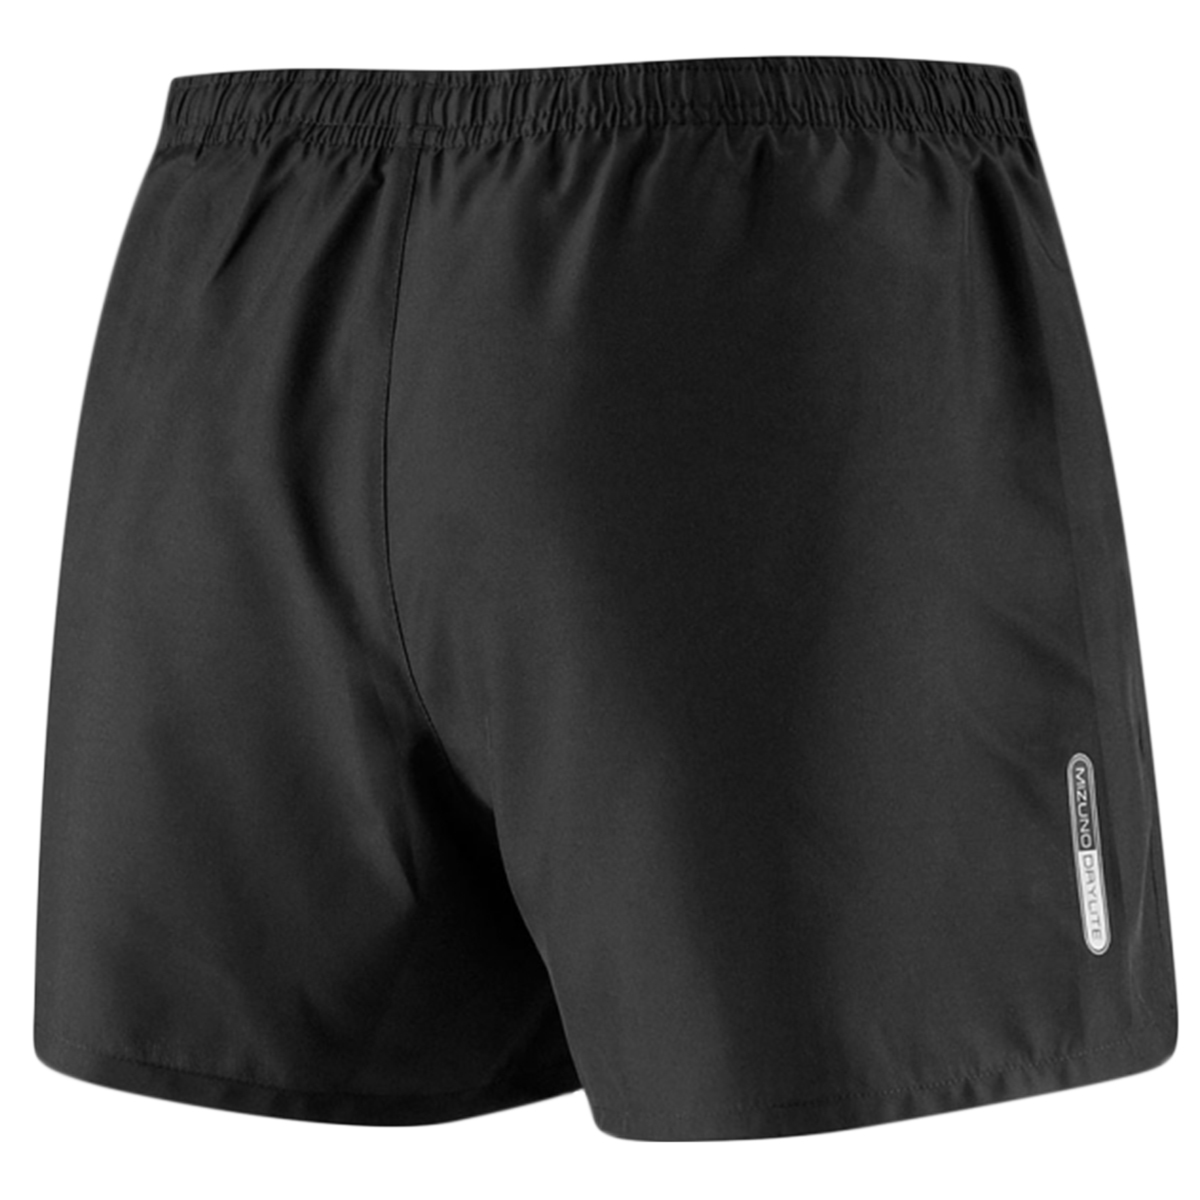 Женские спортивные шорты Mizuno DryLite Core Square 4.1 (J2GB4207 09) фото